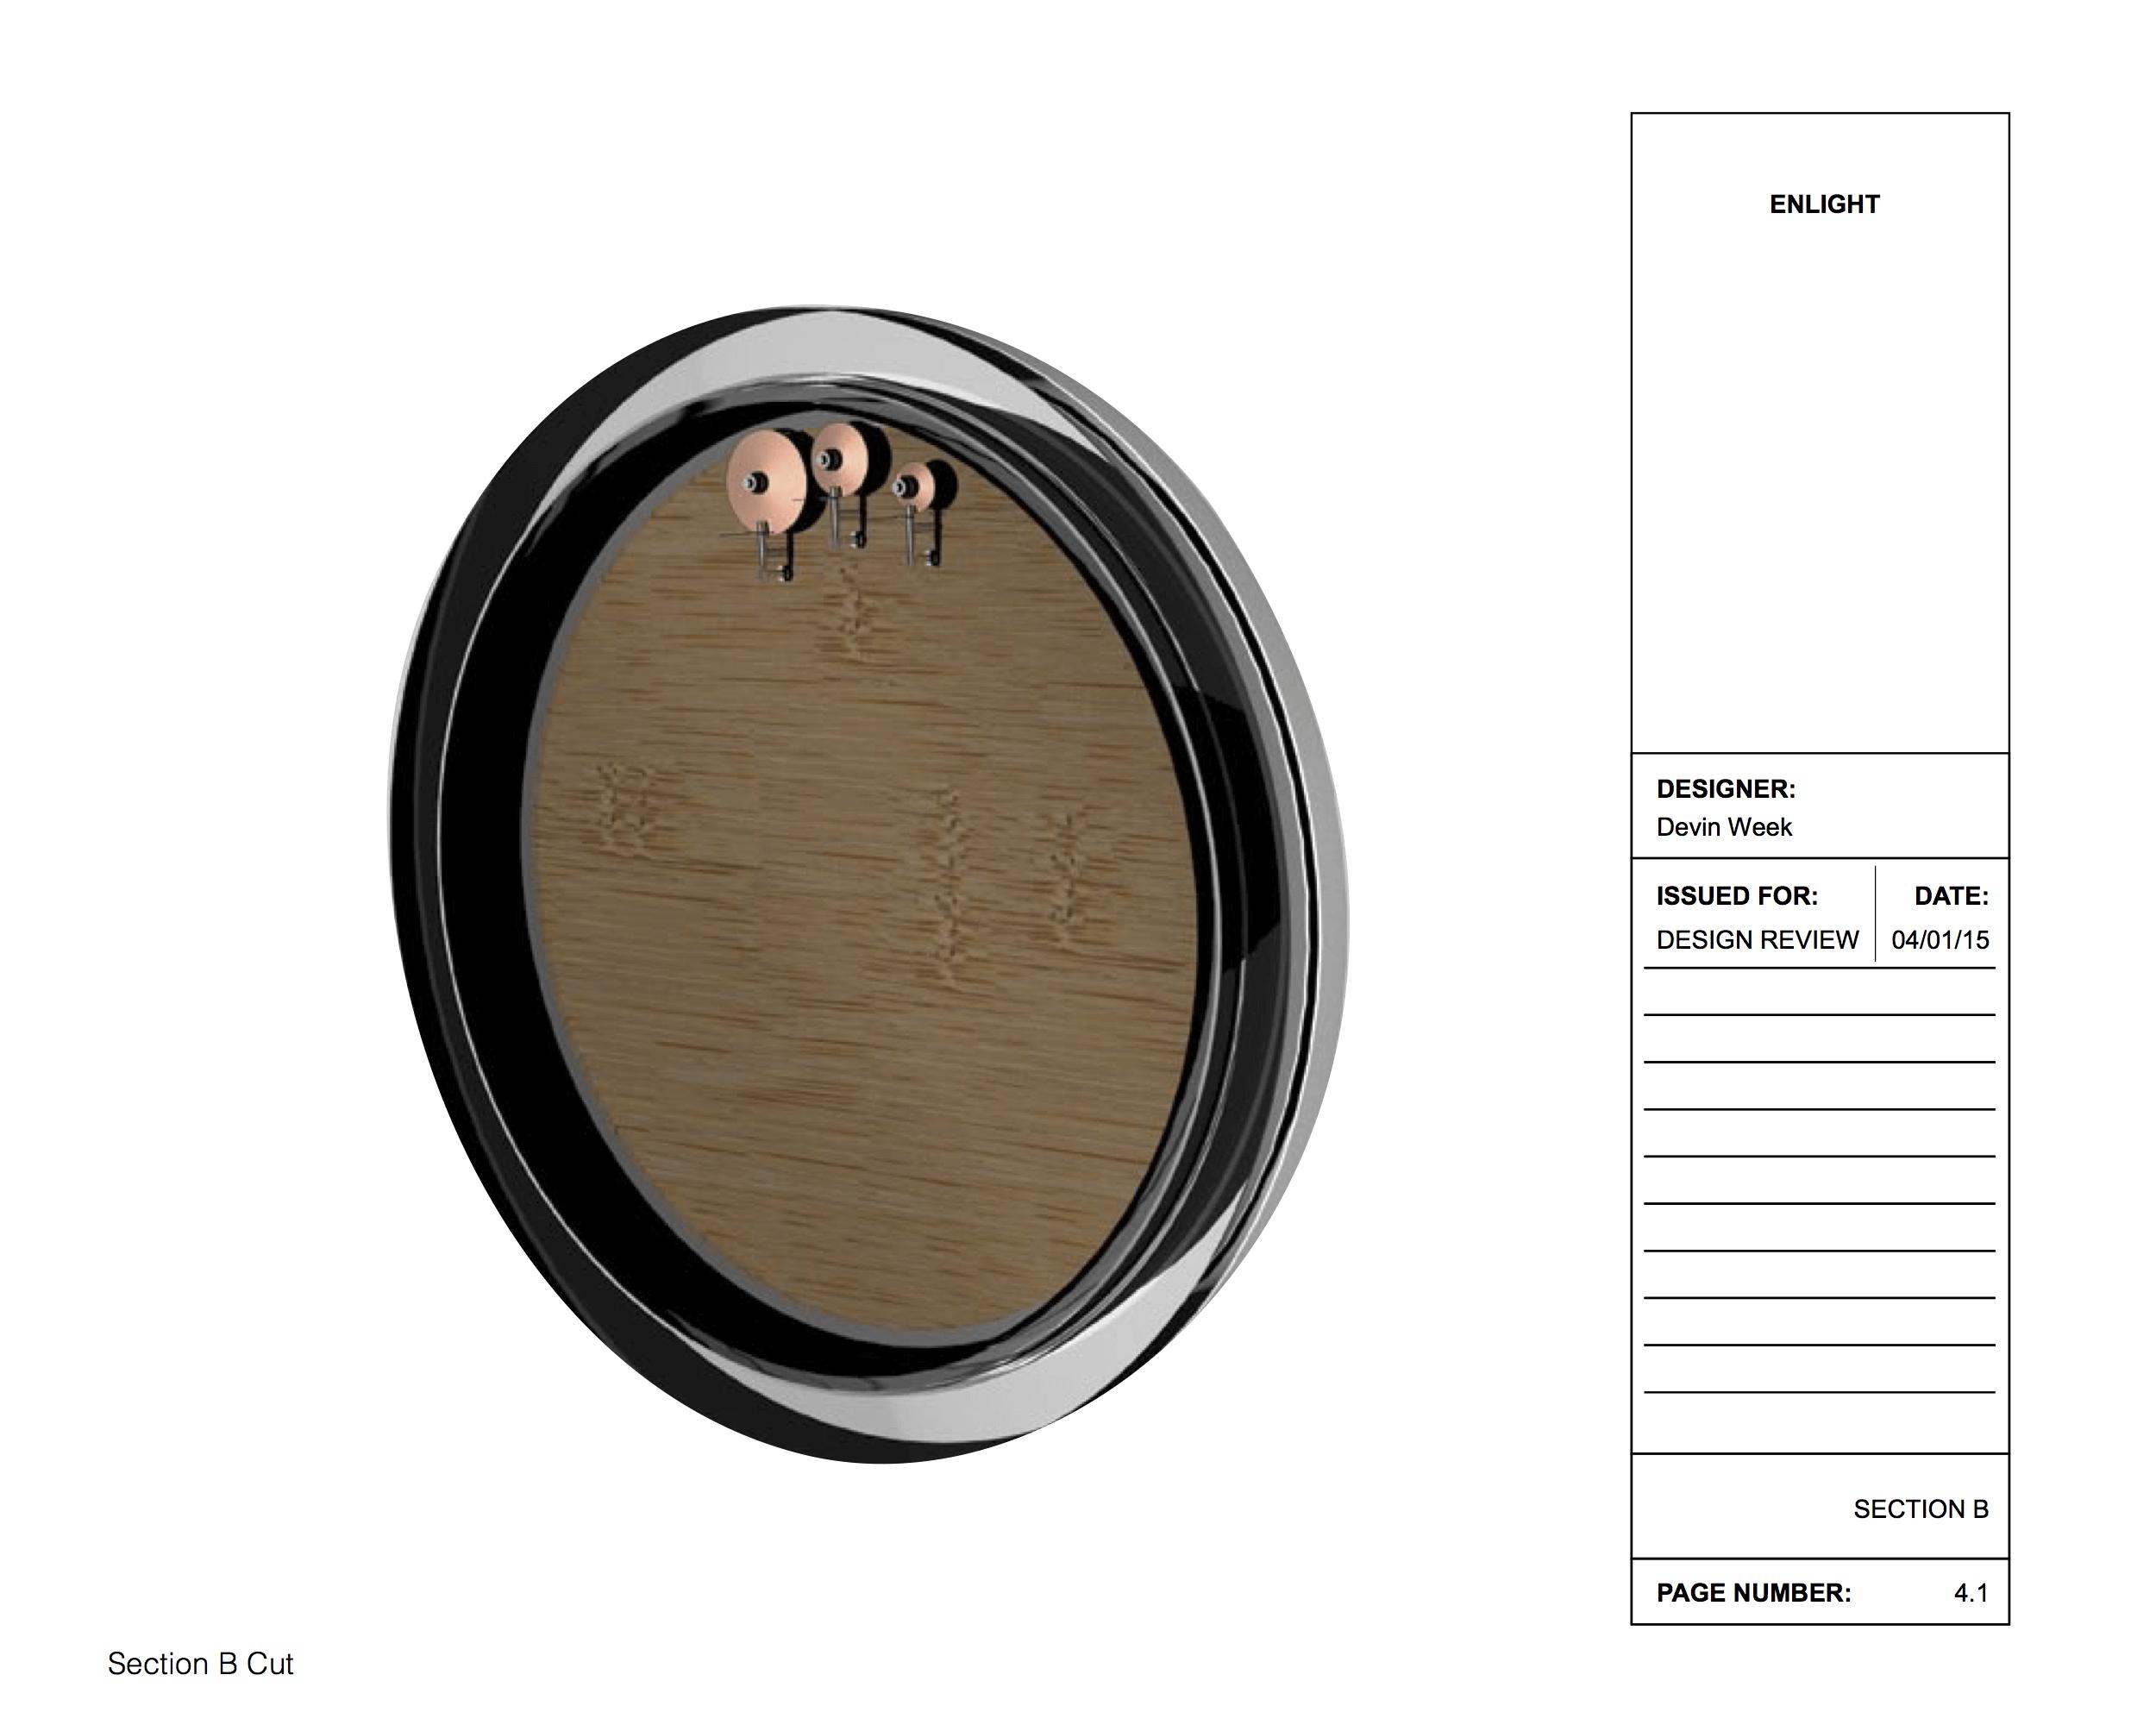 DesignPorfolio2016 (dragged) 10.png